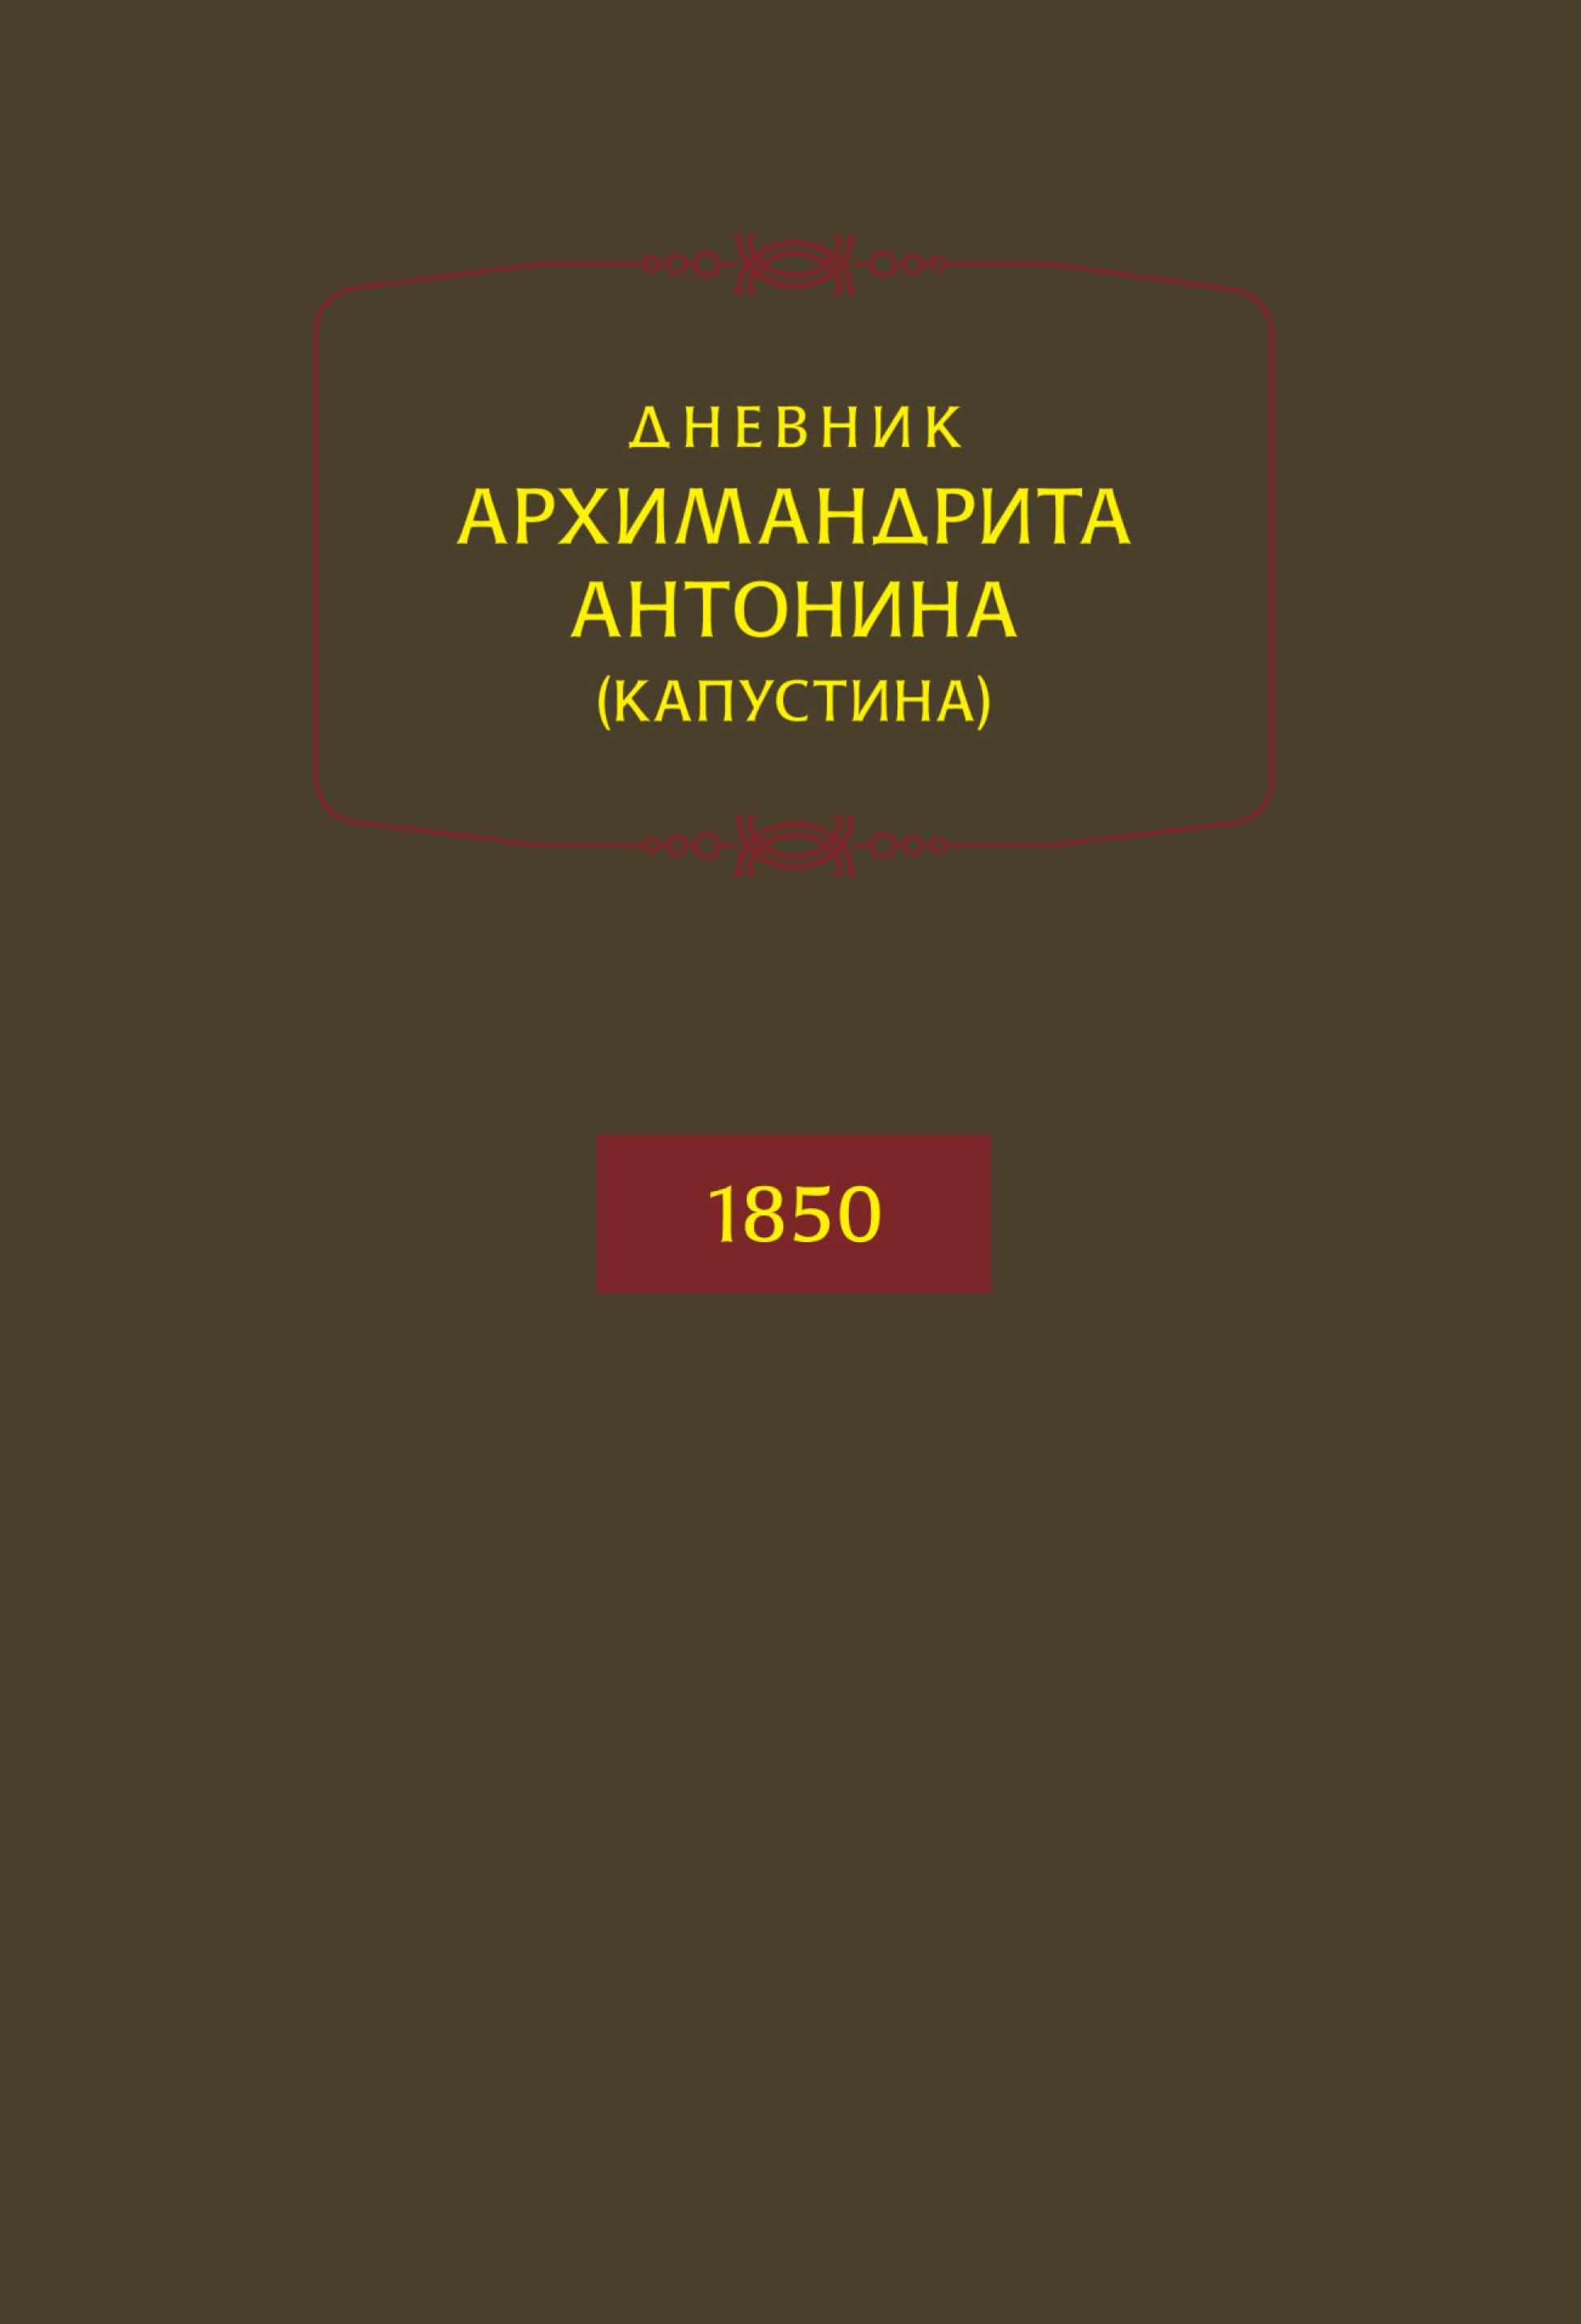 архимандрит Антонин Капустин Дневник архимандрита Антонина (Капустина). 1850 антонина гонцова путь света